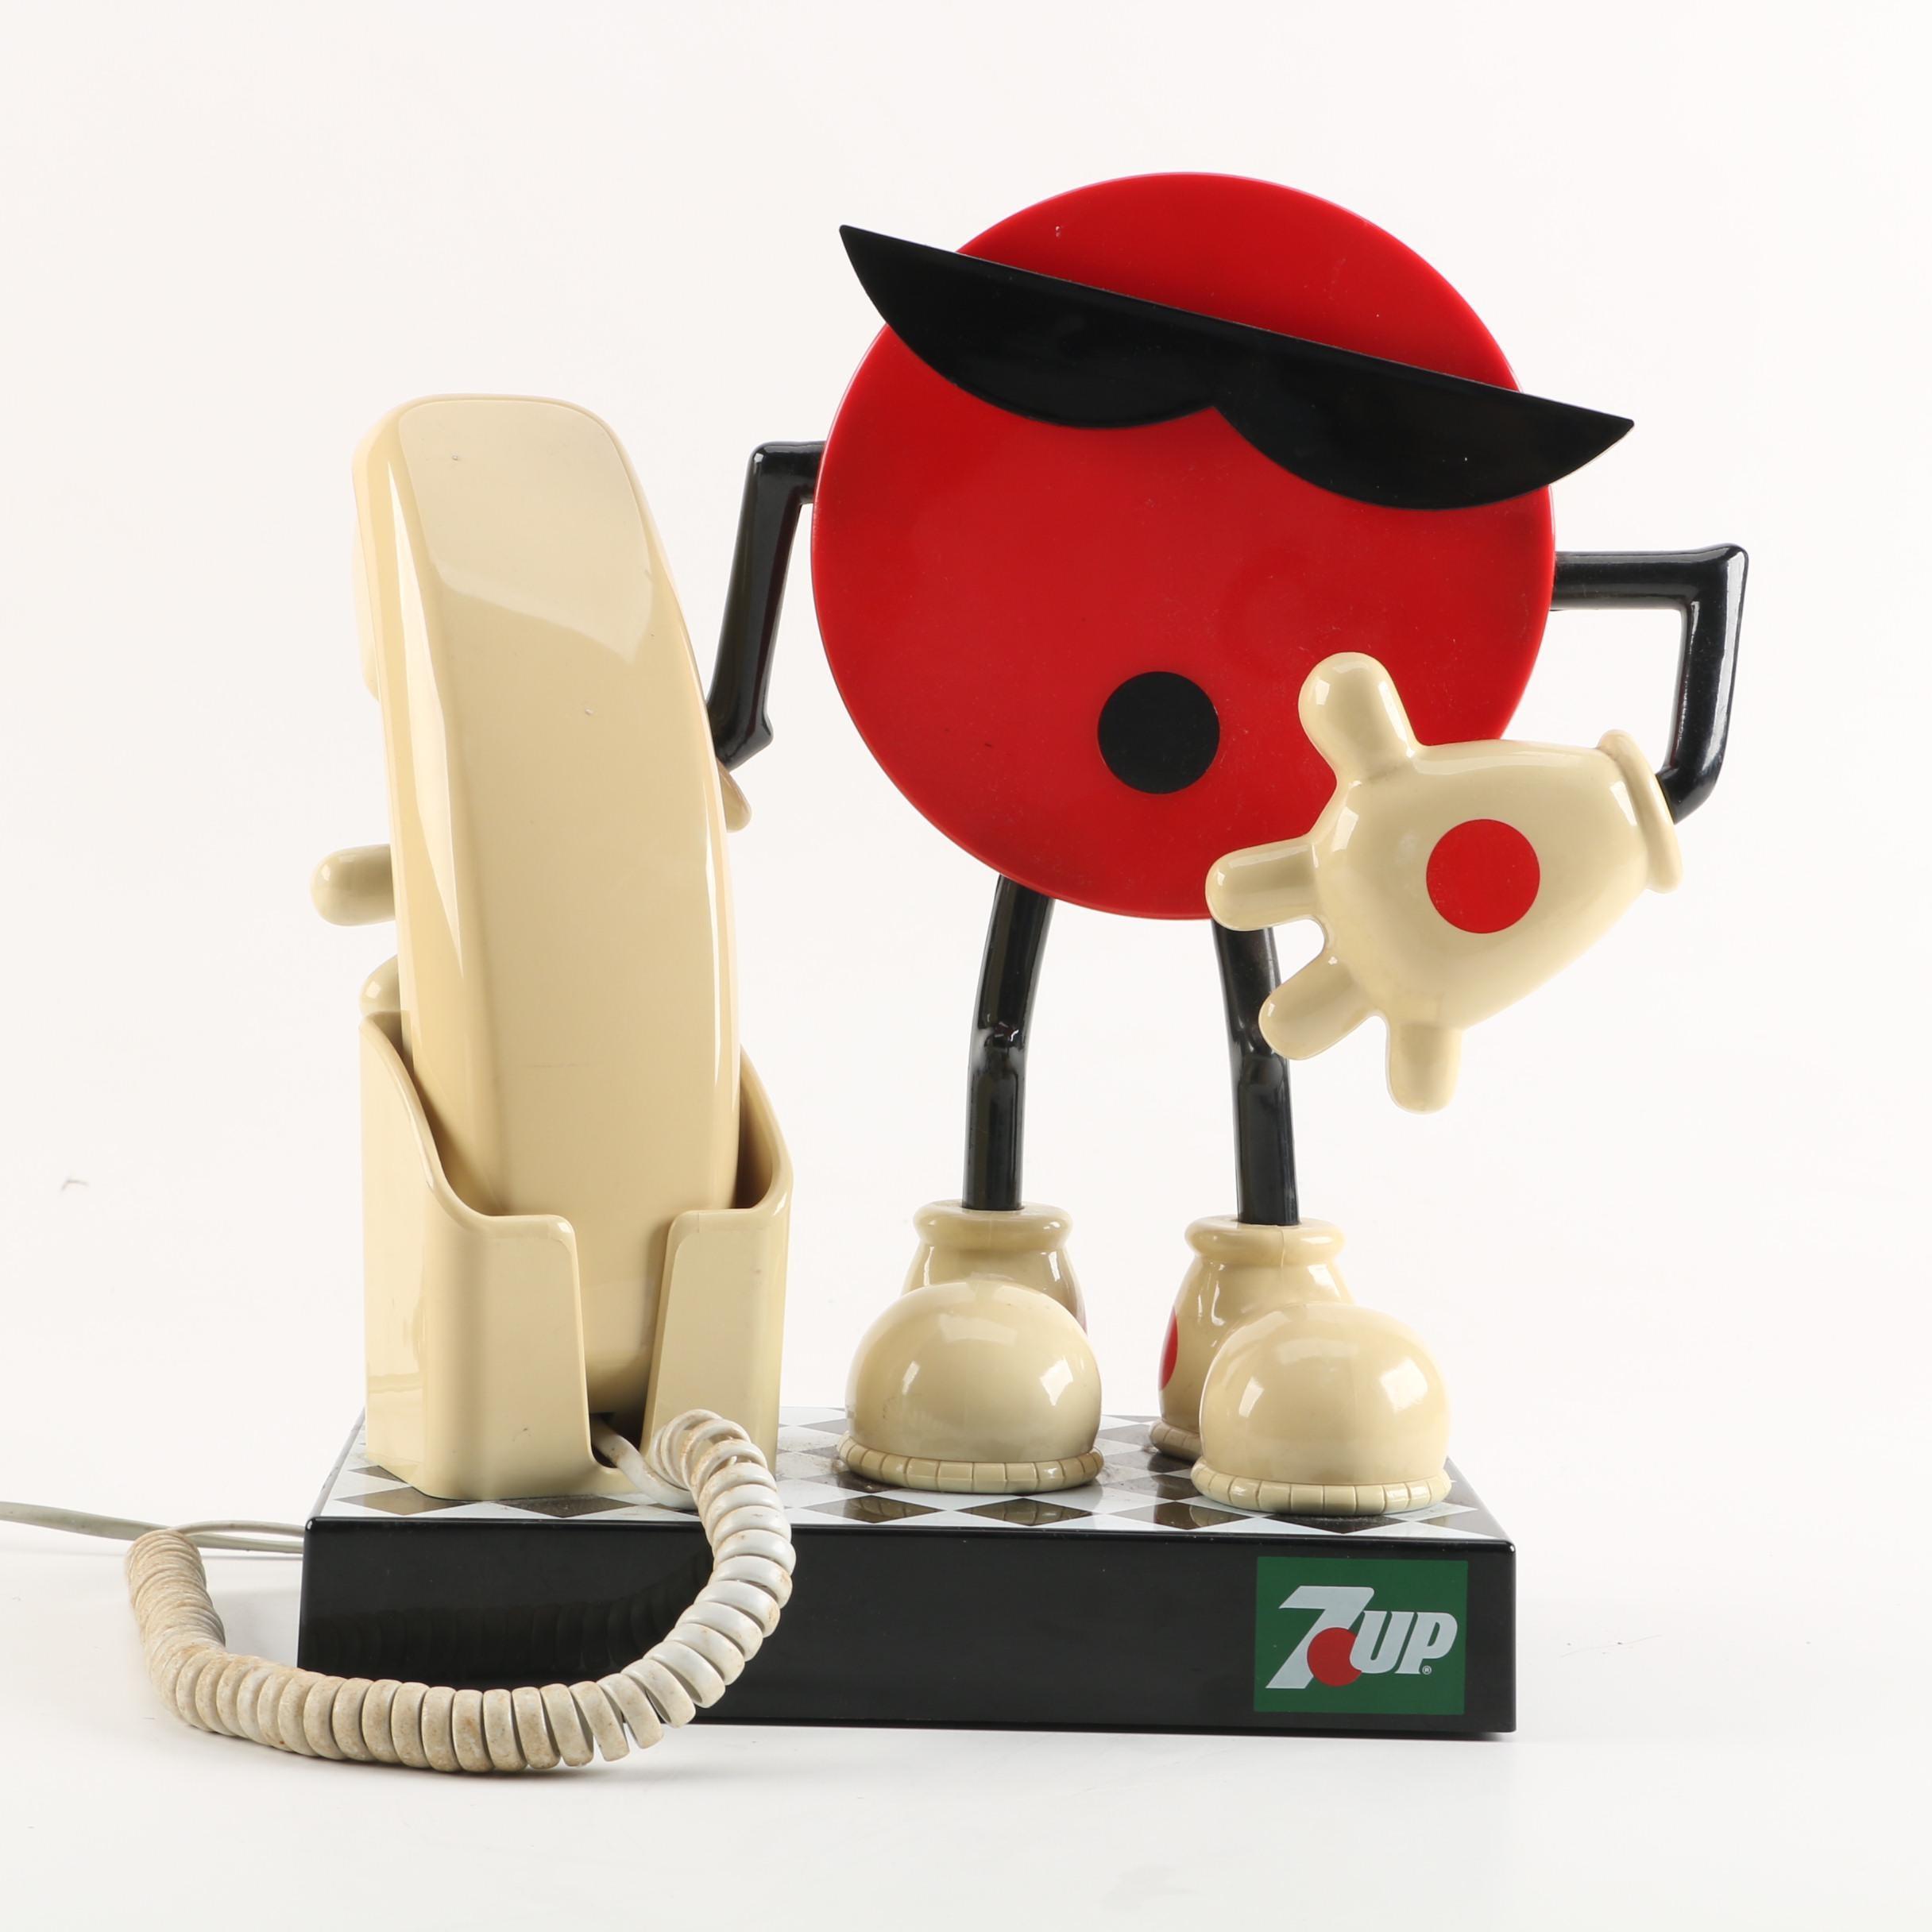 1990 7-UP Spot Telephone